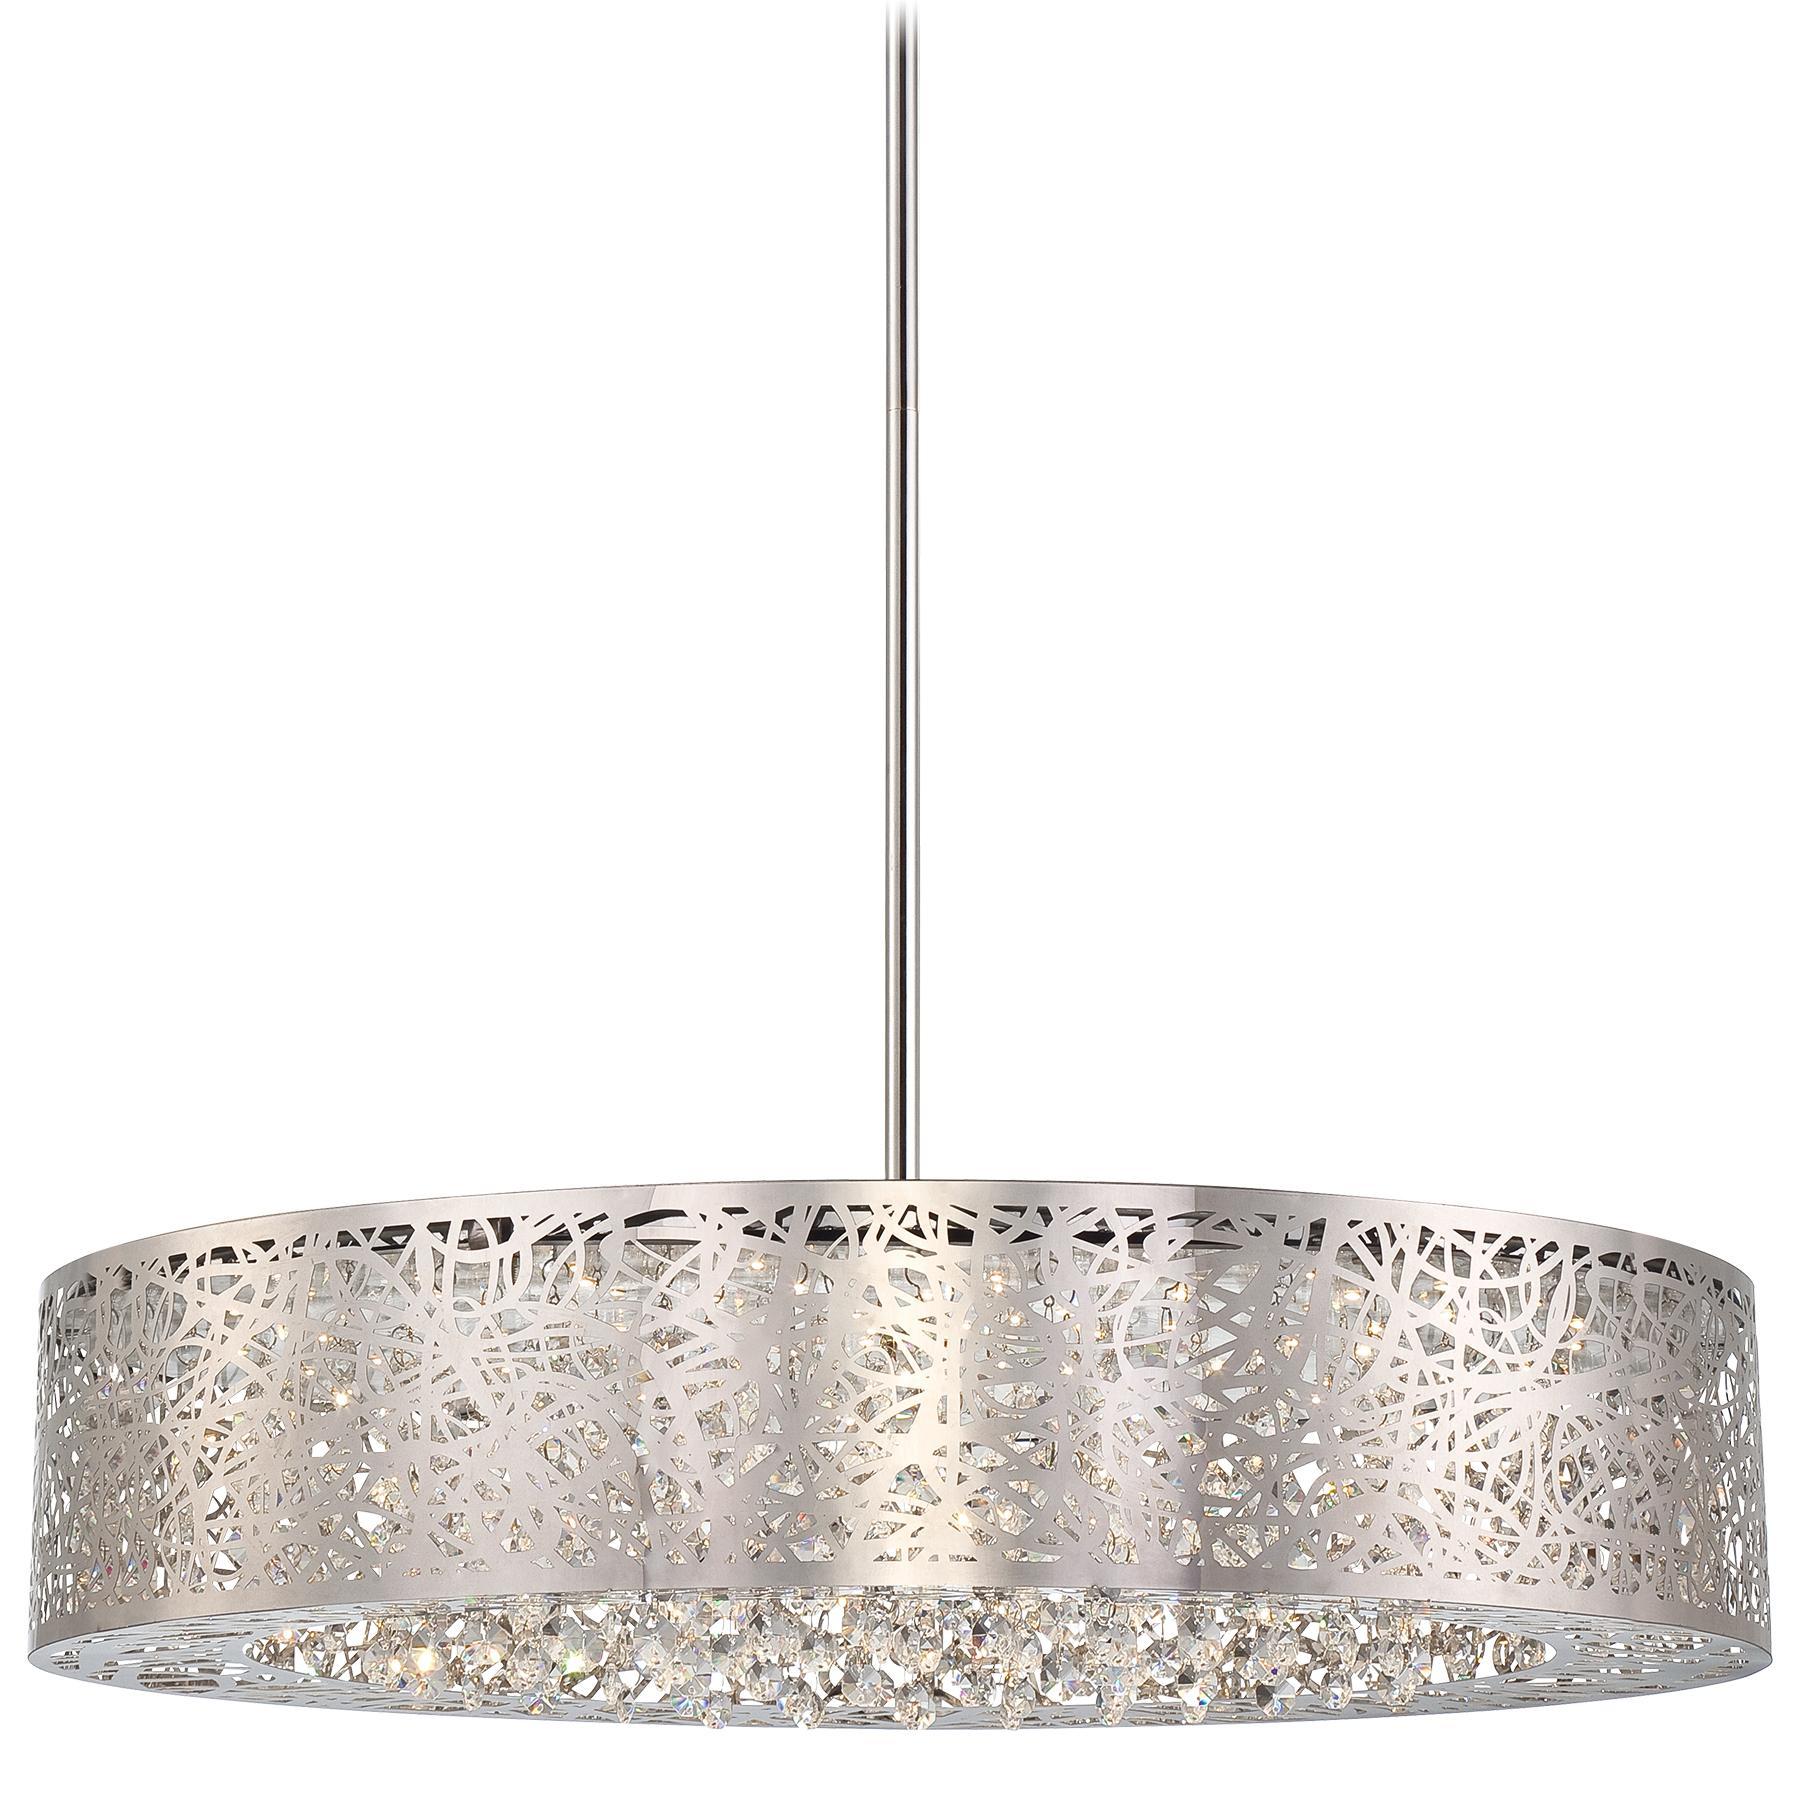 gems led round chandelier by george kovacs  pl - hidden gems led round chandelier by george kovacs  pl